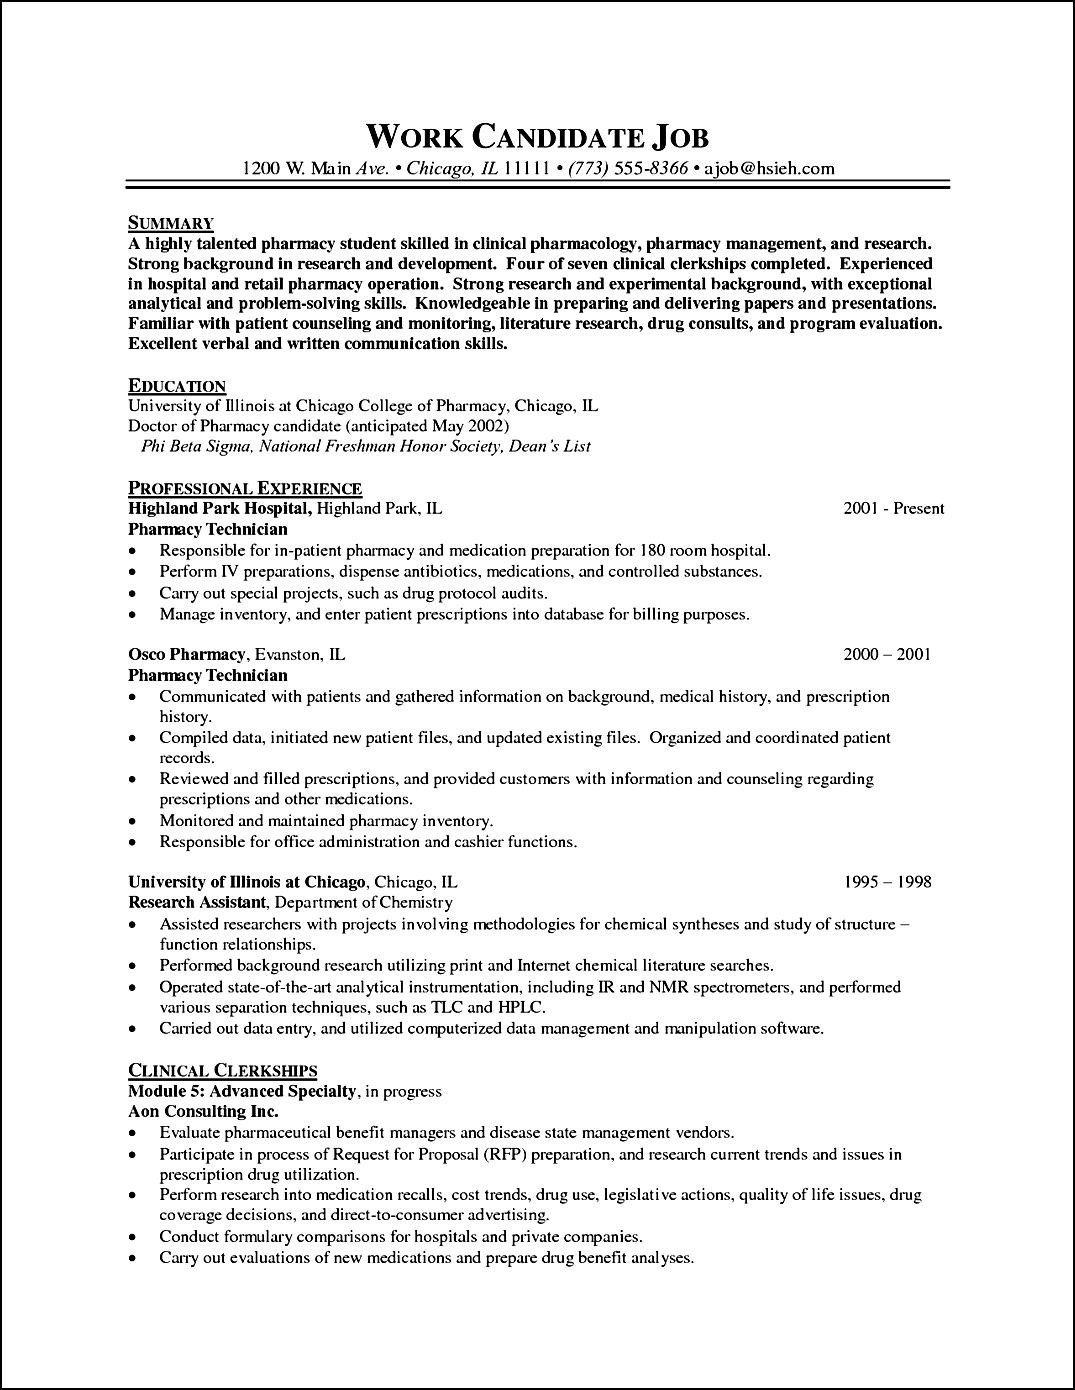 Pharmacist Curriculum Vitae Template Pharmacy Curriculum Vitae Example Free Samples